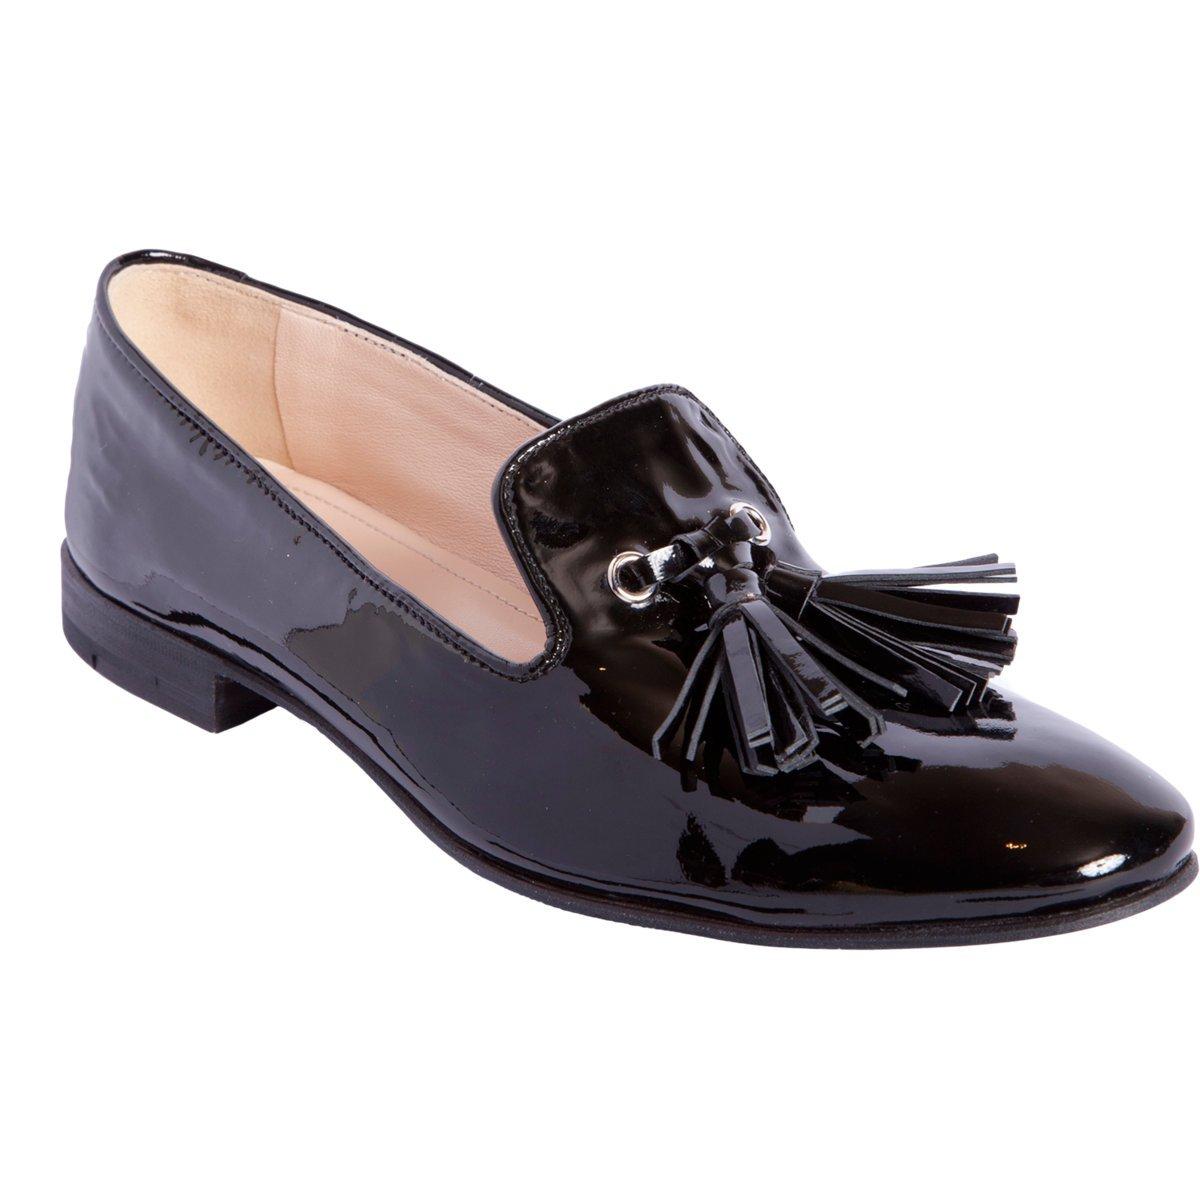 Tassel leather loafers Prada weAF6LqM